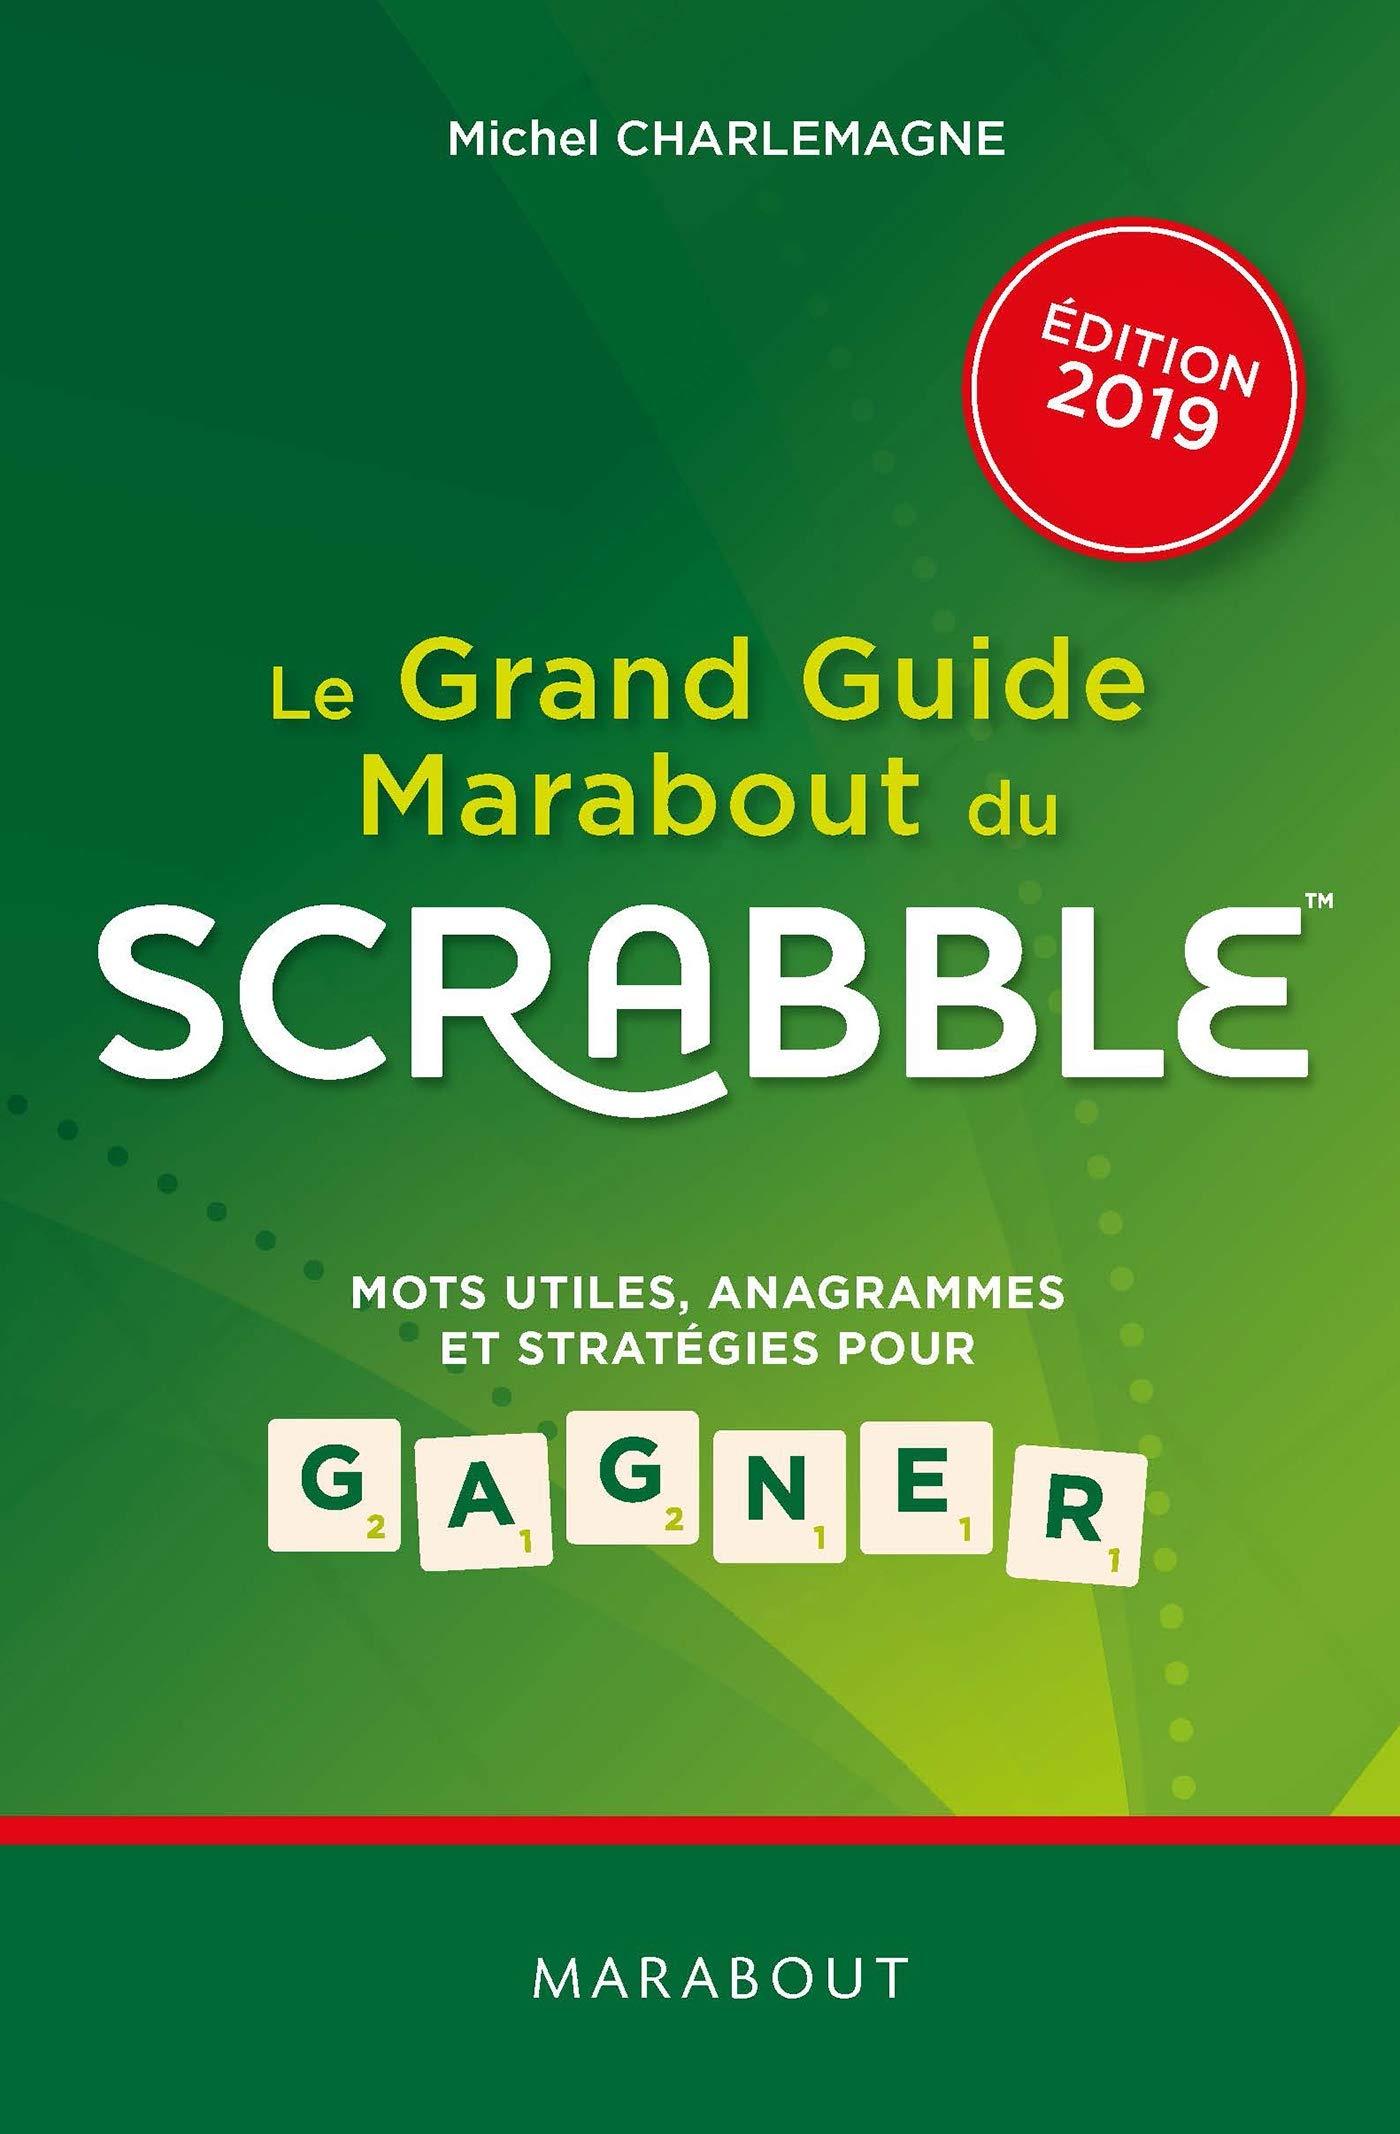 marabout scrabble